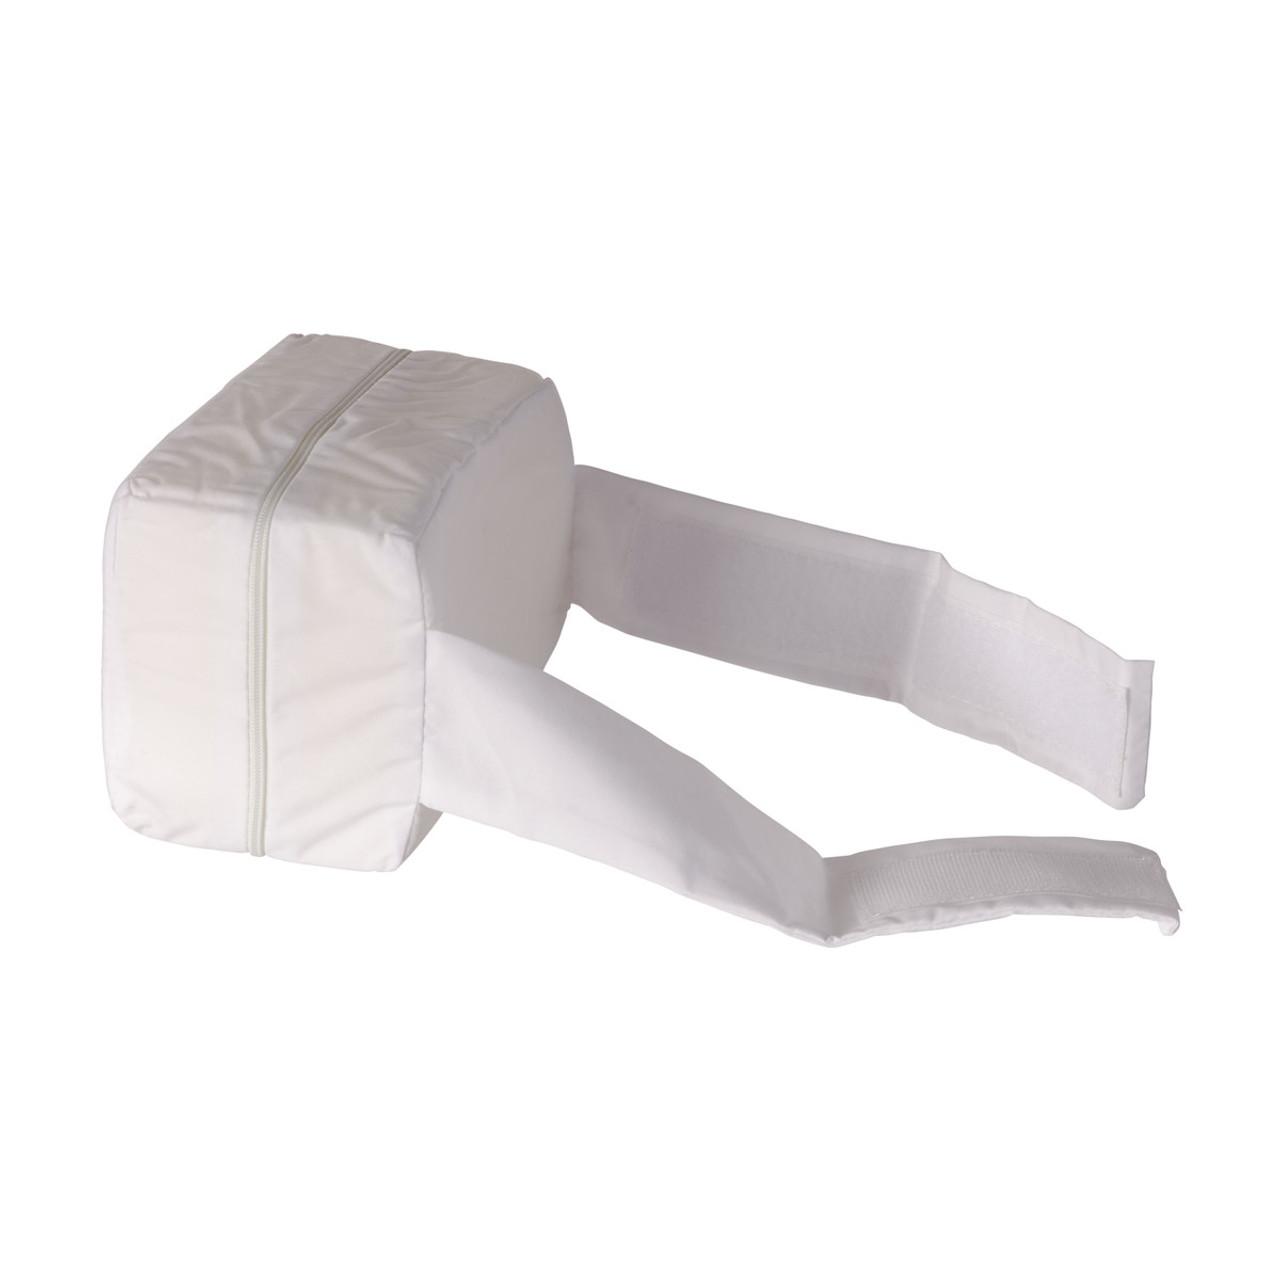 DMI® Knee-Ease Pillows, by Healthsmart